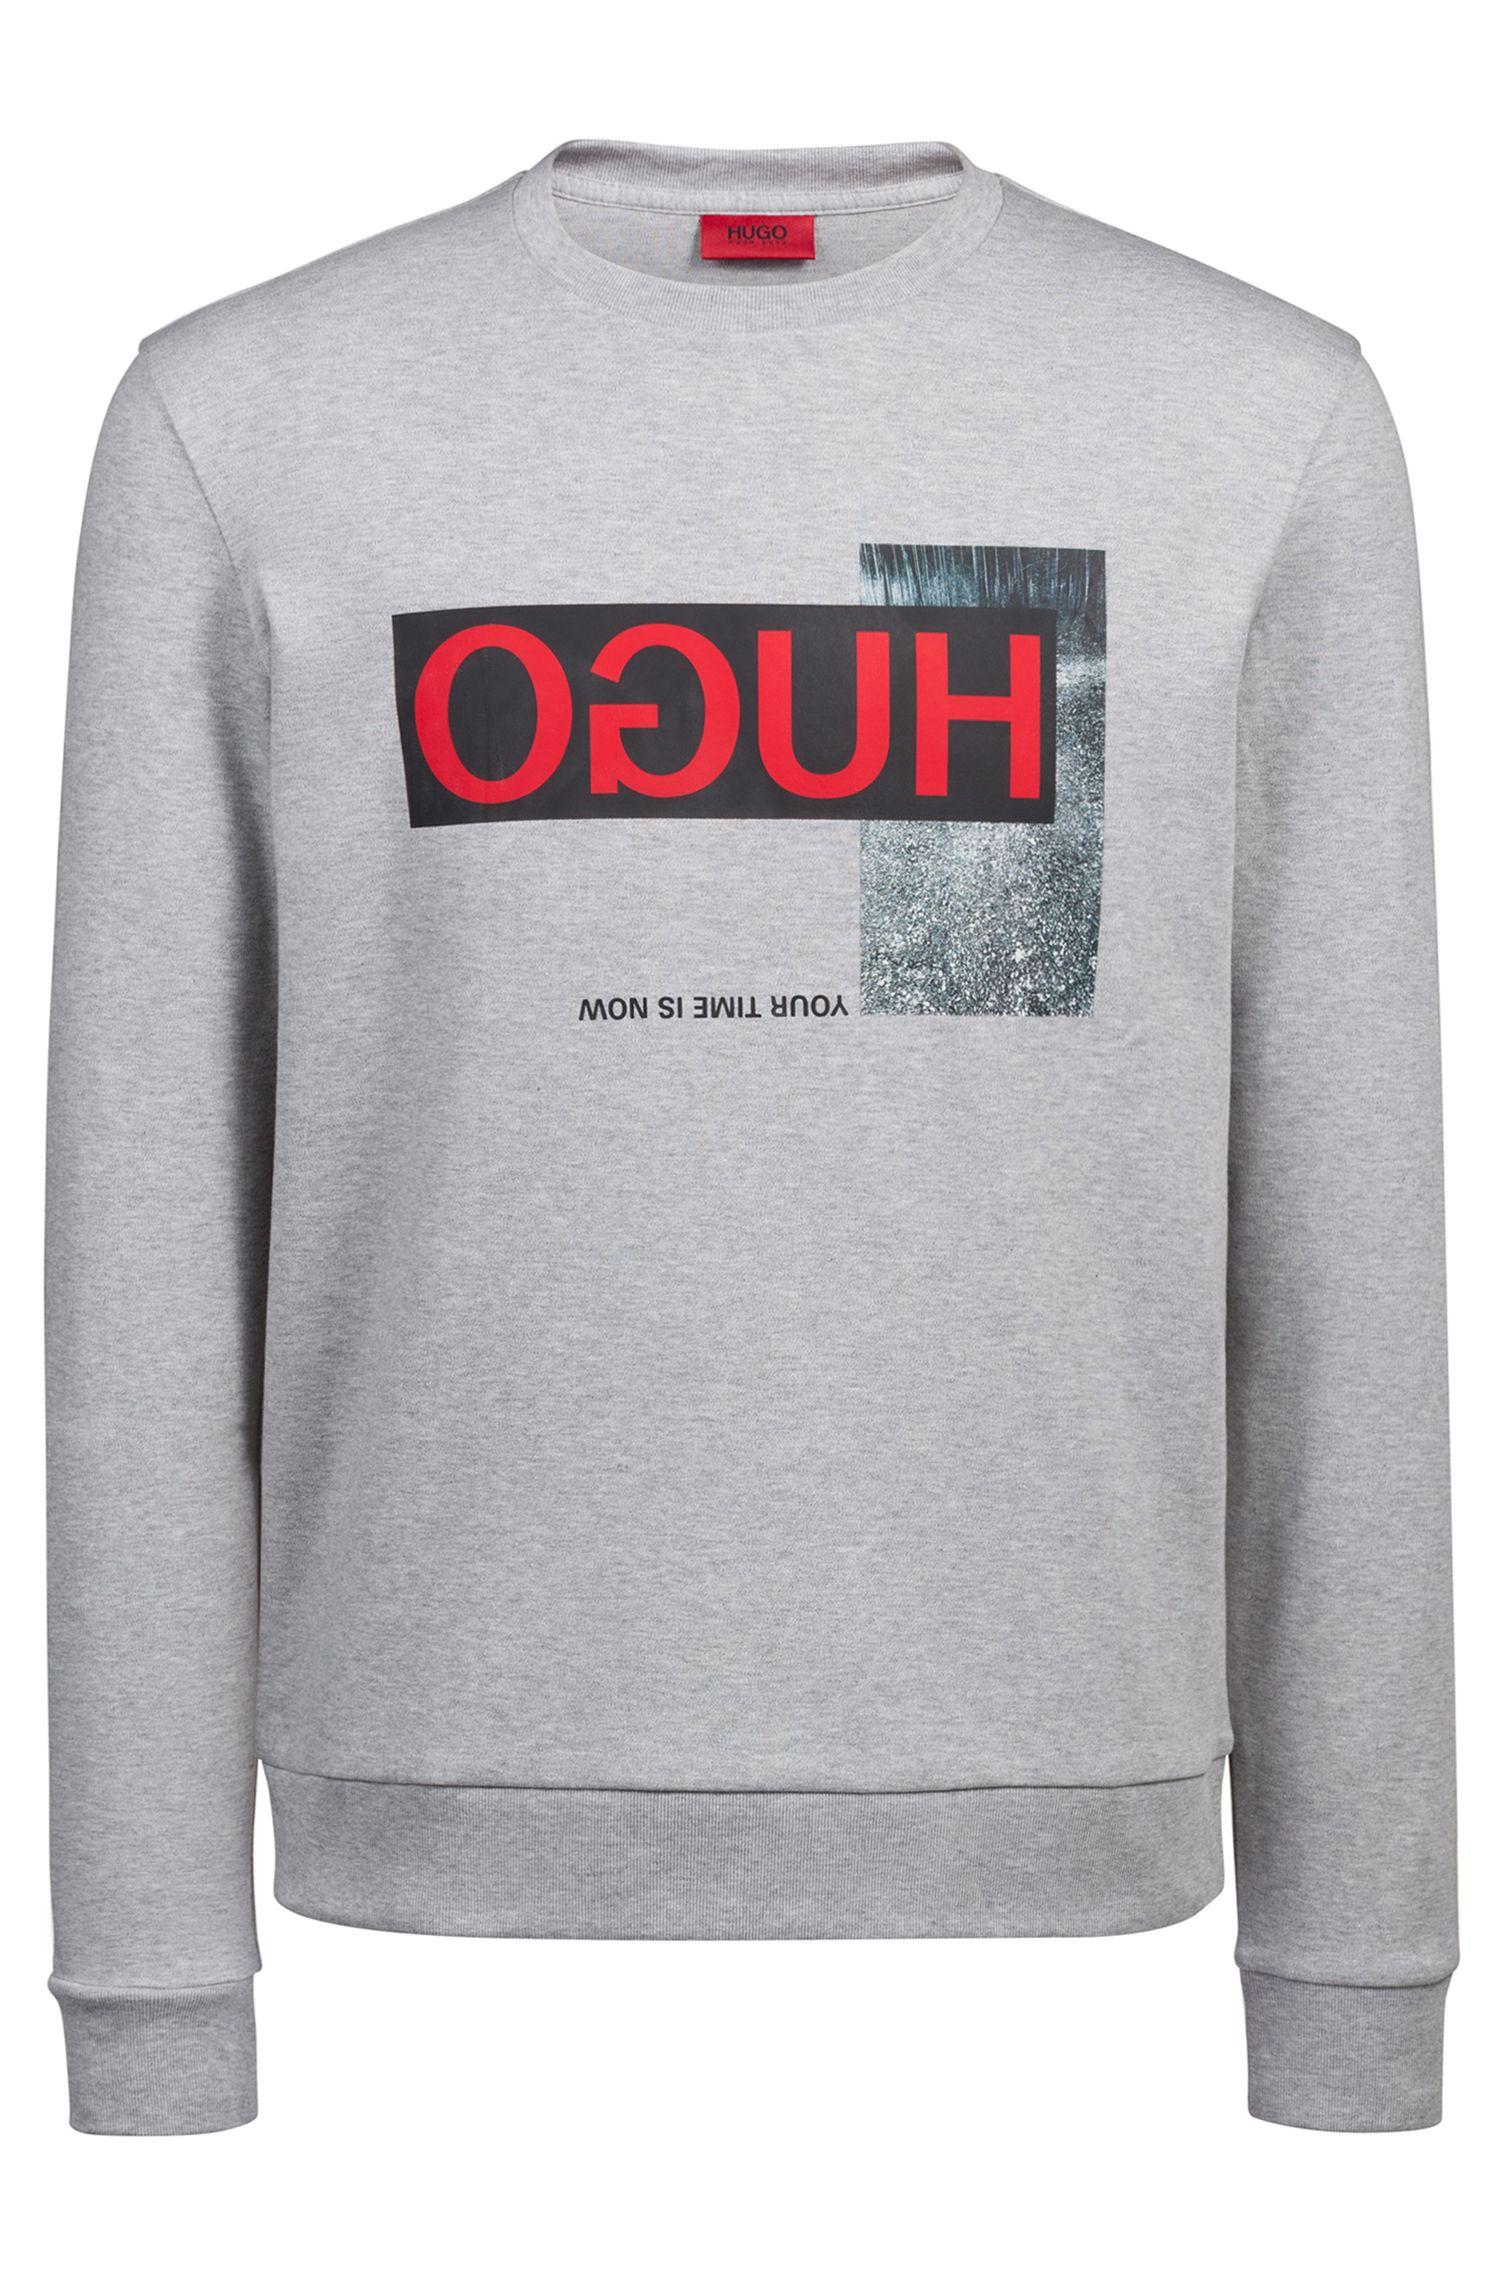 Hugo Boss - Sweatshirt aus  Interlock-Baumwolle mit Reversed-Logo - 1